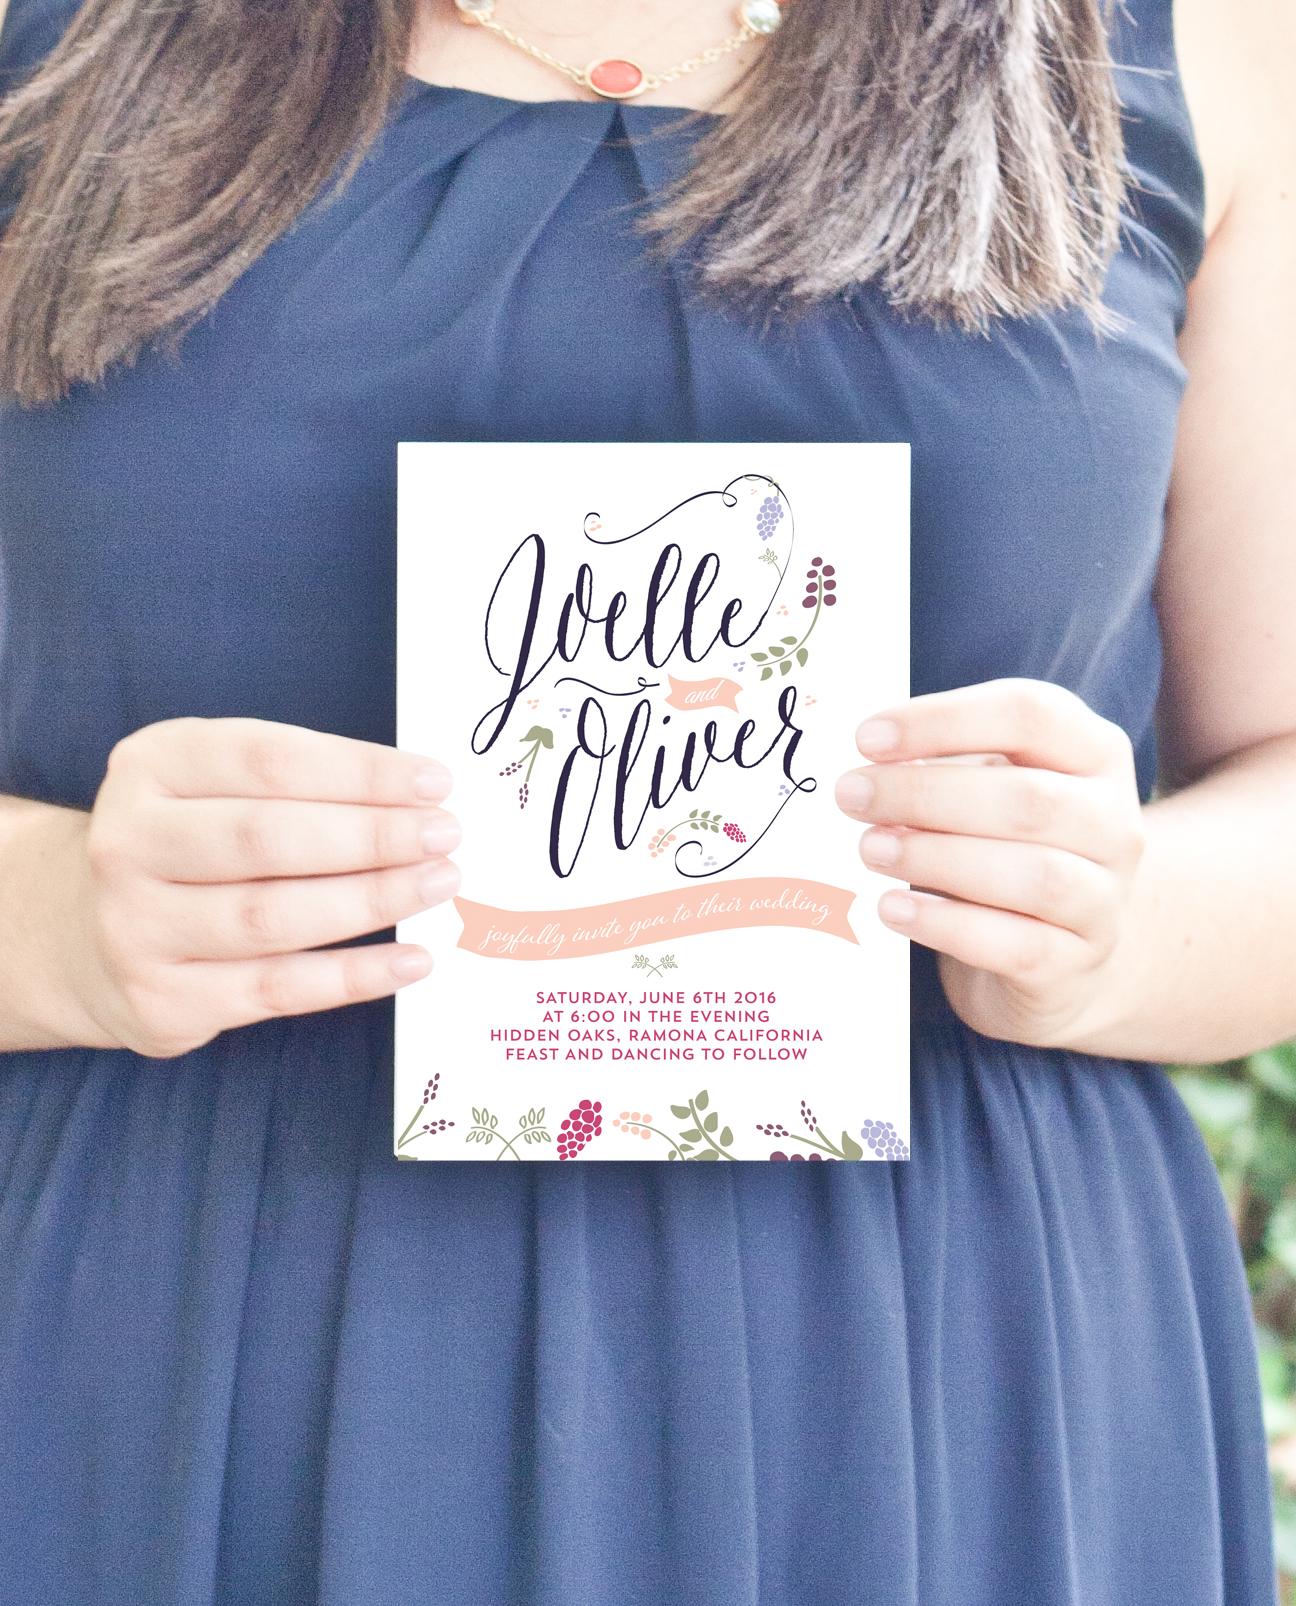 joelle and oliver.jpg